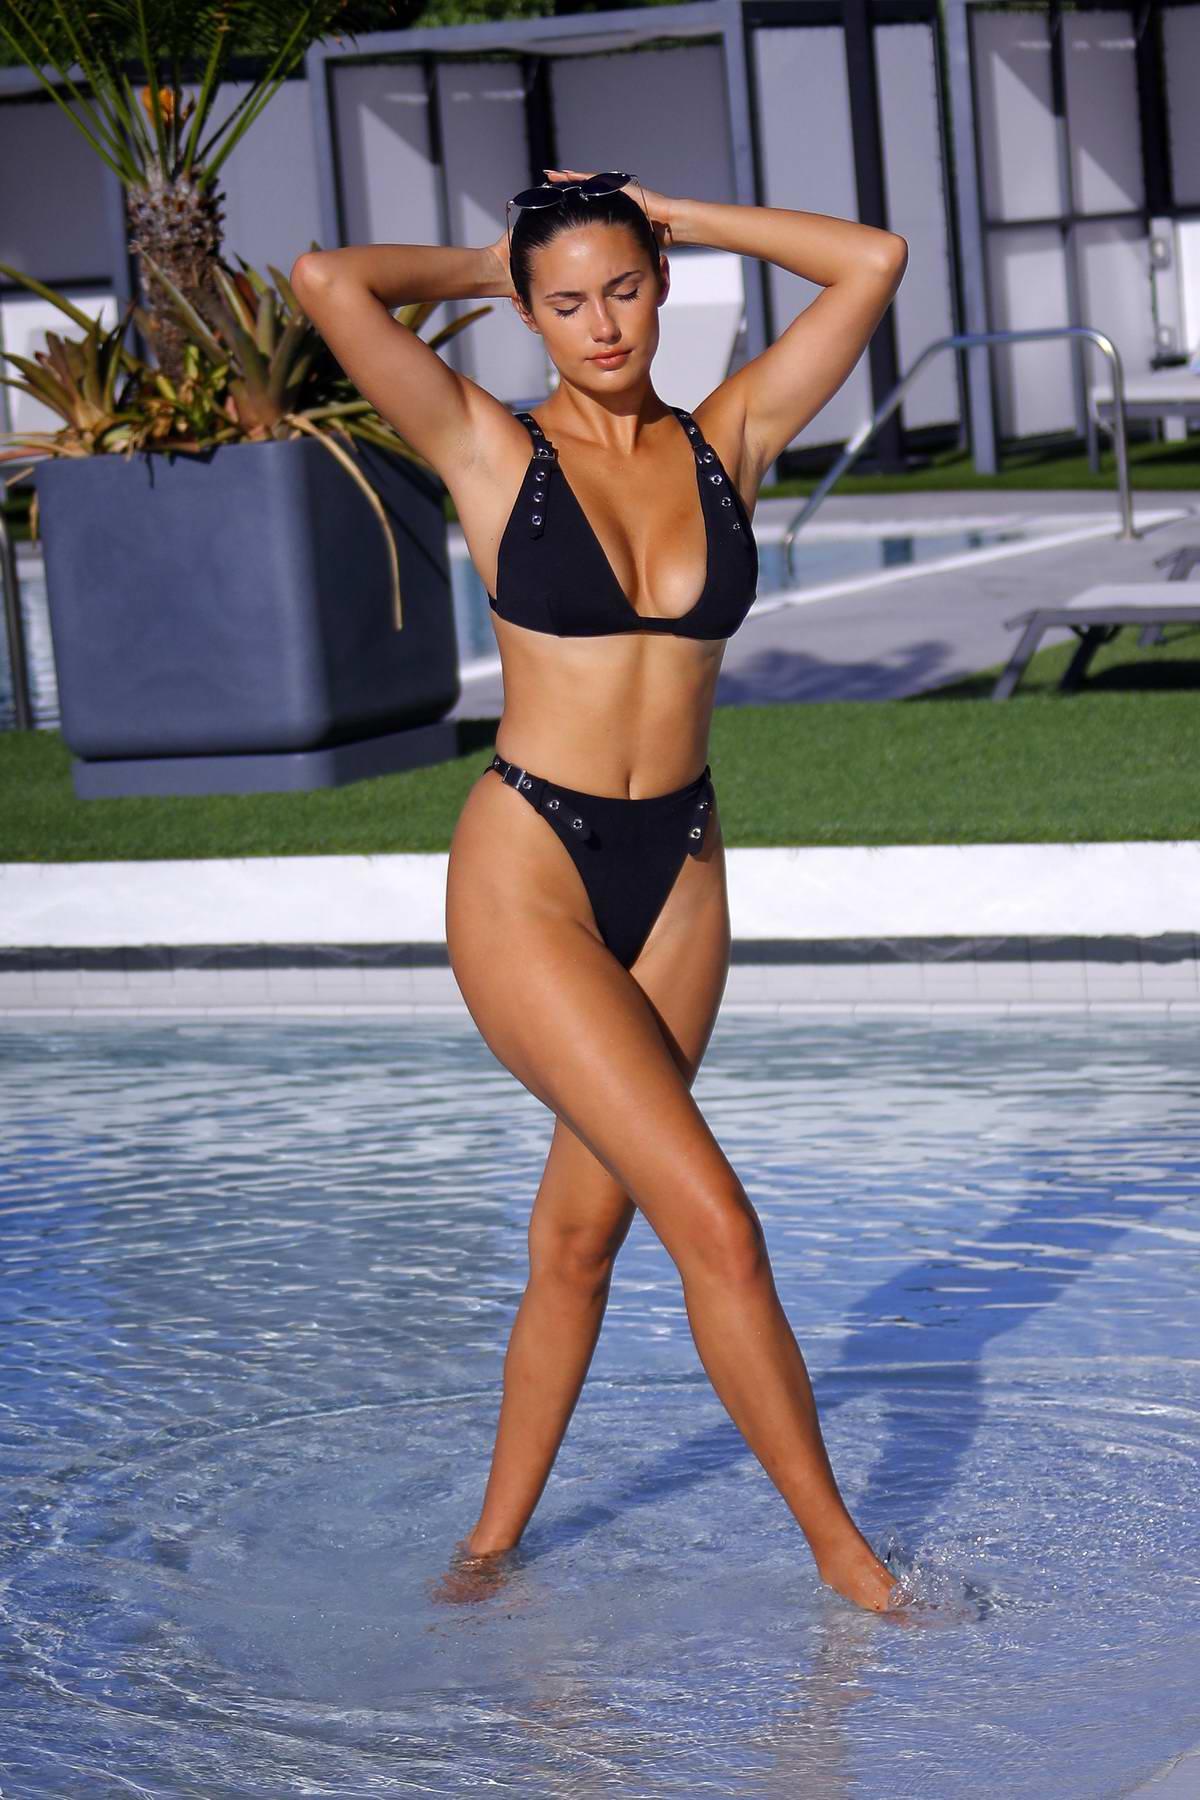 Tao Wickrath soaks up the sun in a black bikini while enjoying the pool at her hotel in Miami Beach, Florida